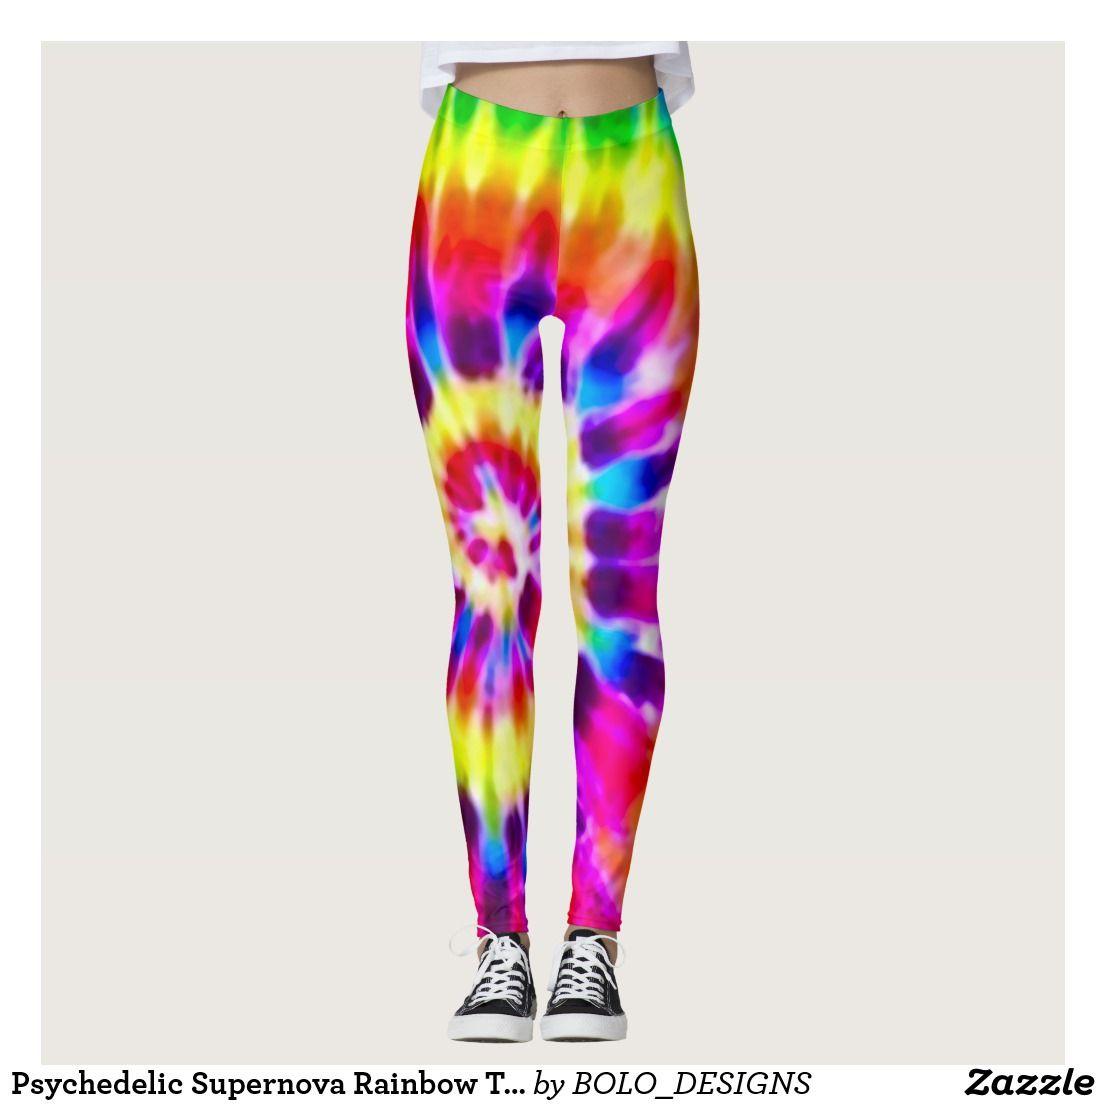 Psychedelic Supernova Rainbow Tie Dye Leggings Zazzle